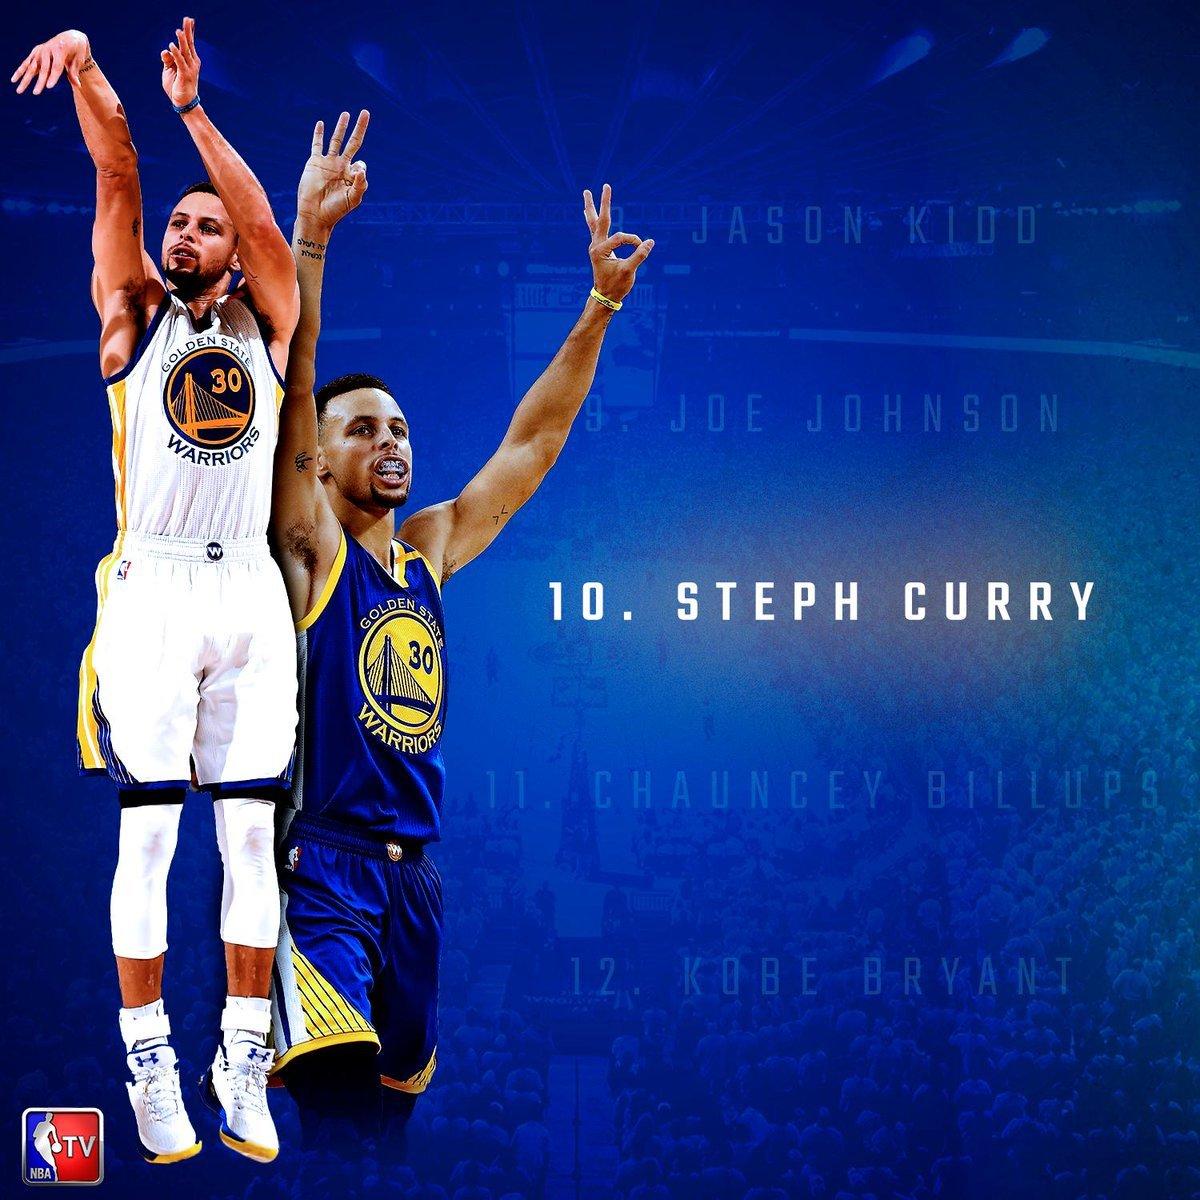 NBA: El Top 10 De Triples De Curry, El Triplista Top 10 De